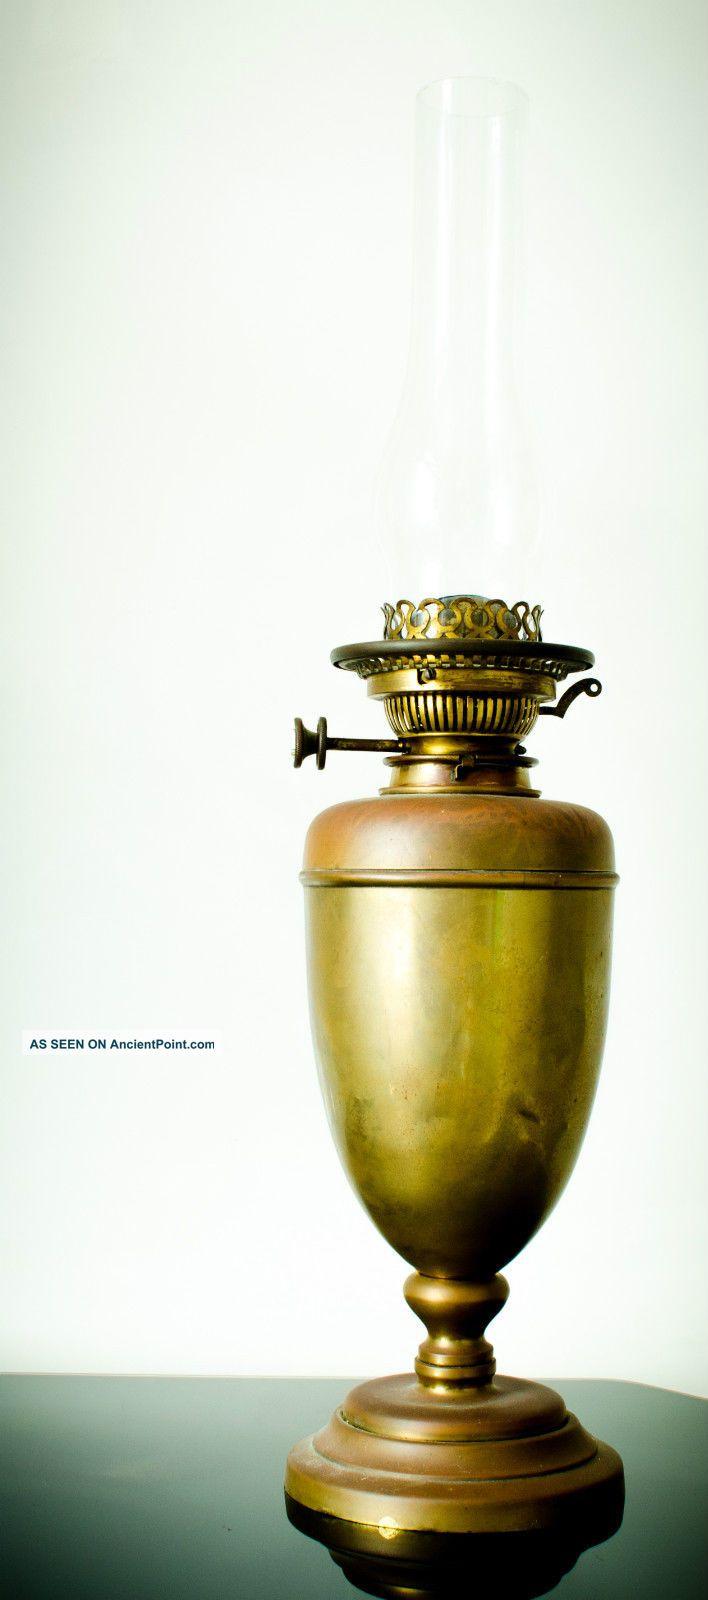 Hinks No.  2 Oil Lamp Brass Duplex Burner,  Key Rising,  Brass Lamp,  Chimney Tall 20th Century photo